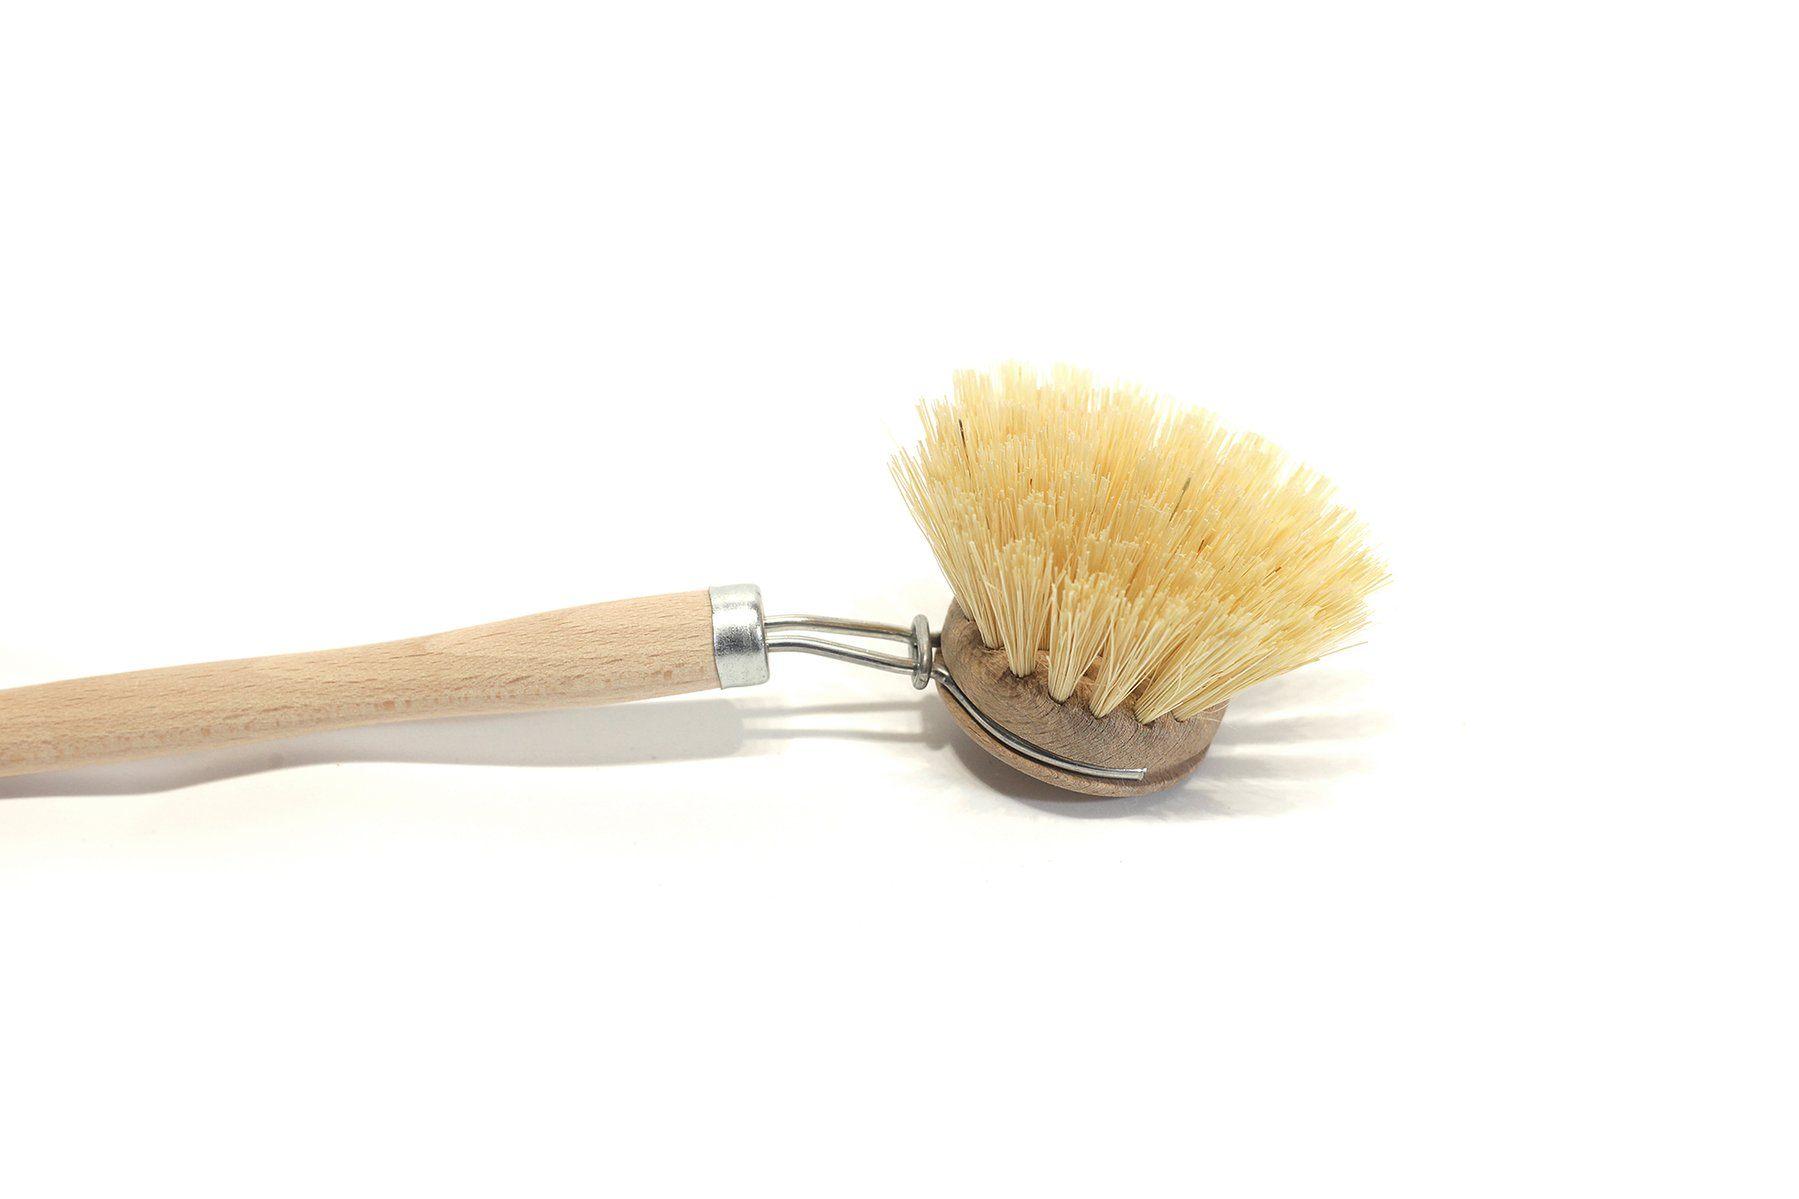 Redecker Wooden Dish Brush with Vegan Bristles wood